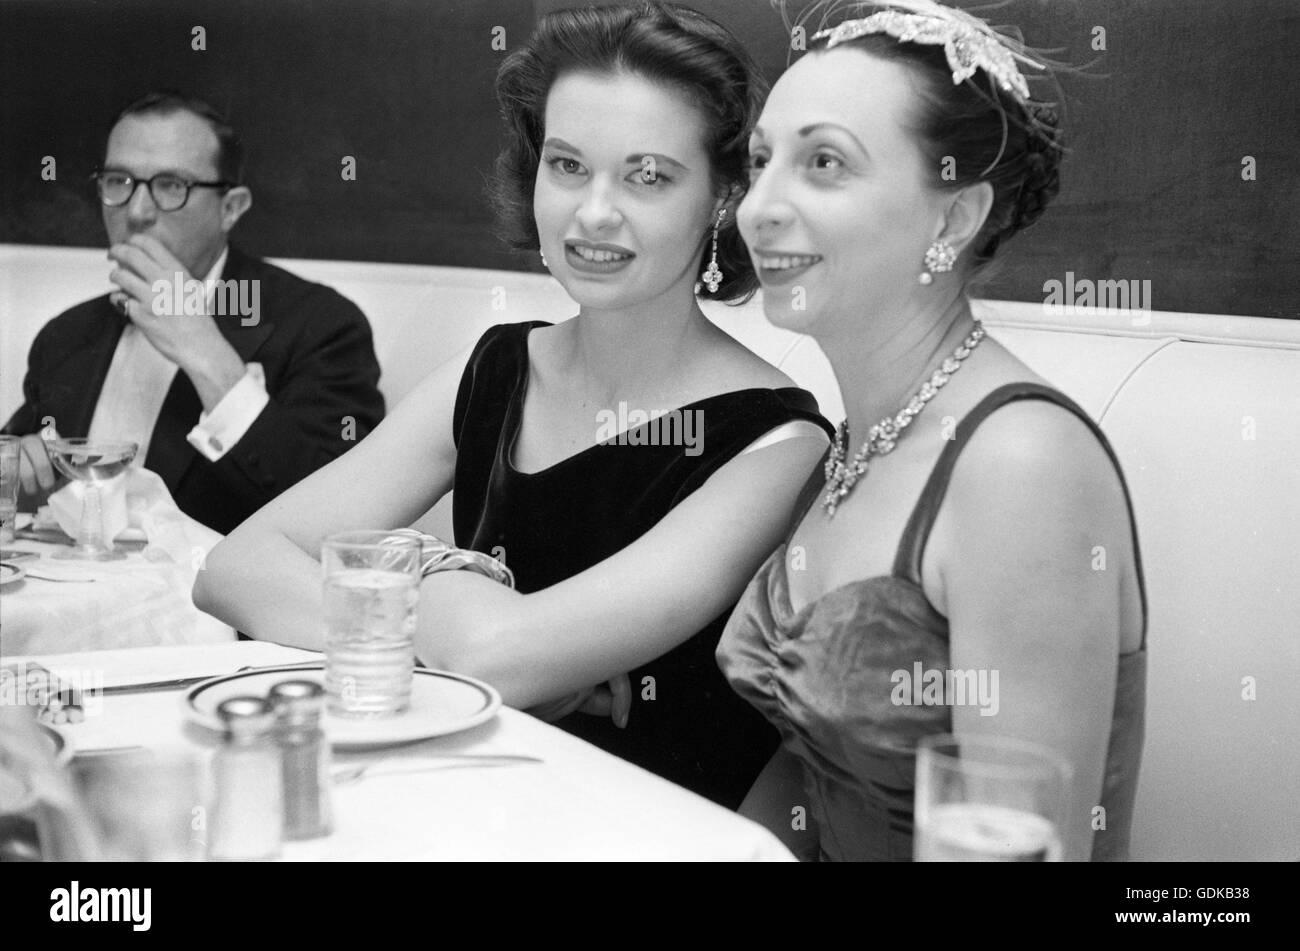 Gloria Vanderbilt, at dinner with friends, 1955. - Stock Image